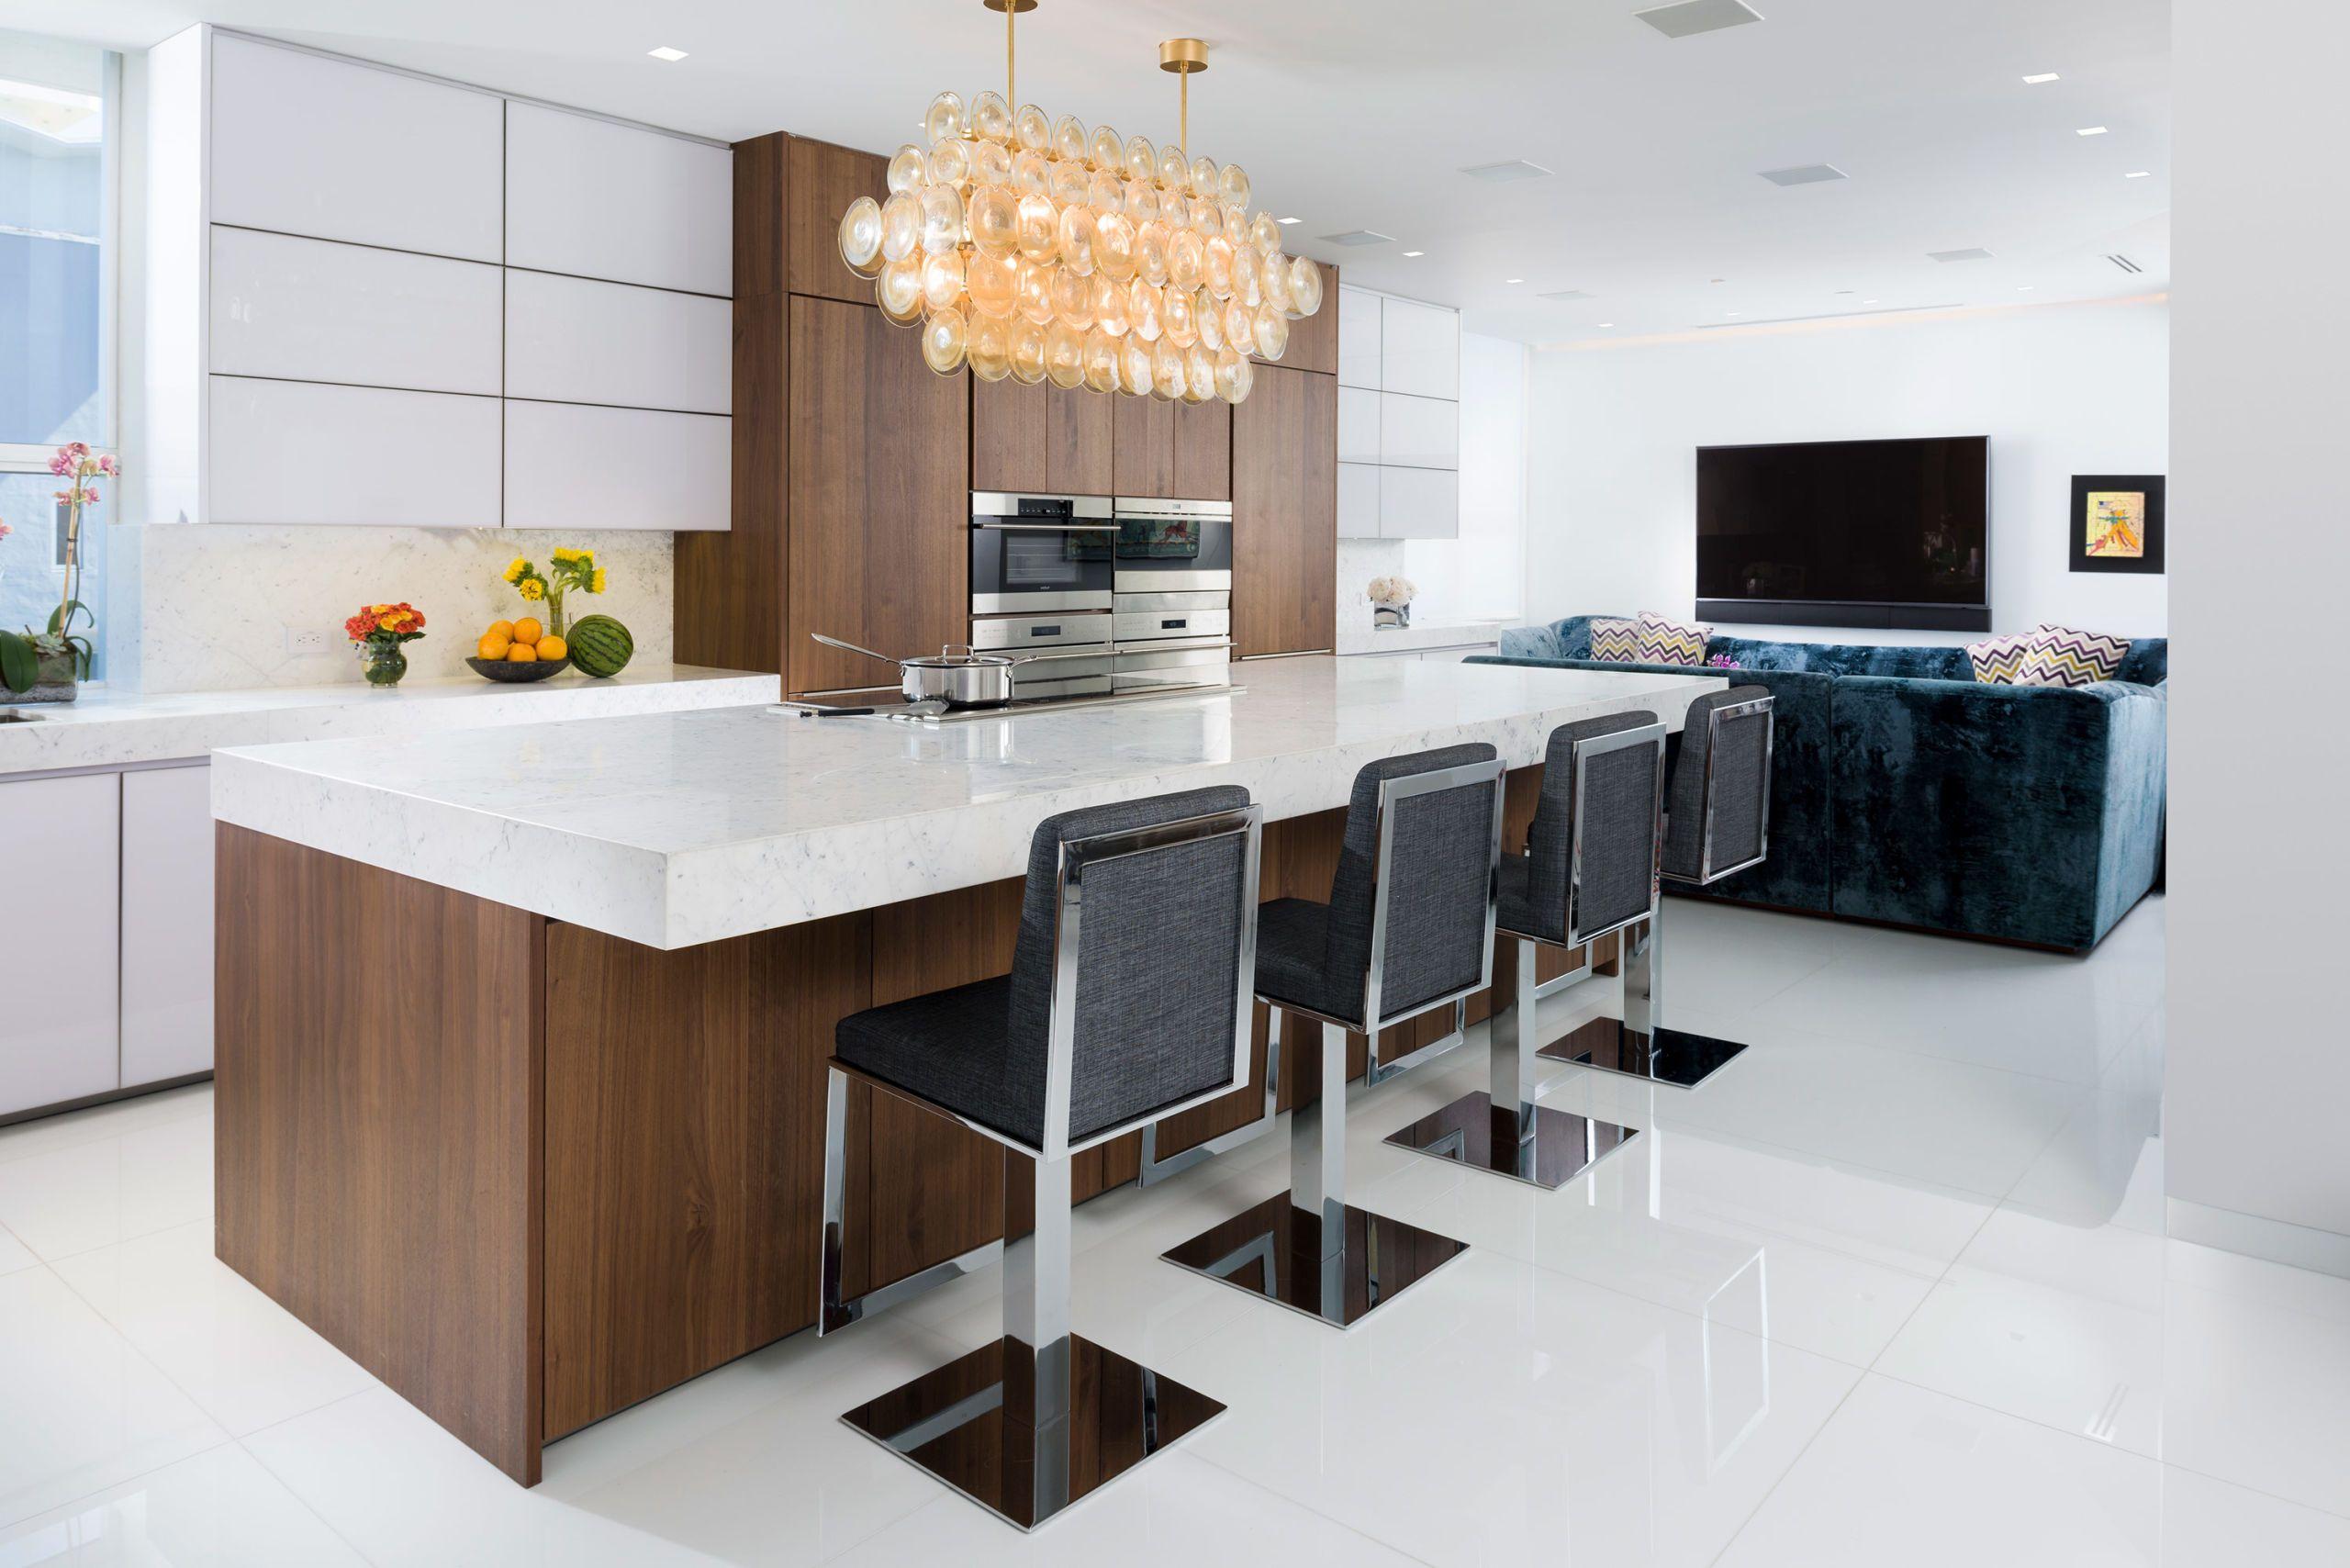 Elegant Marble Countertops